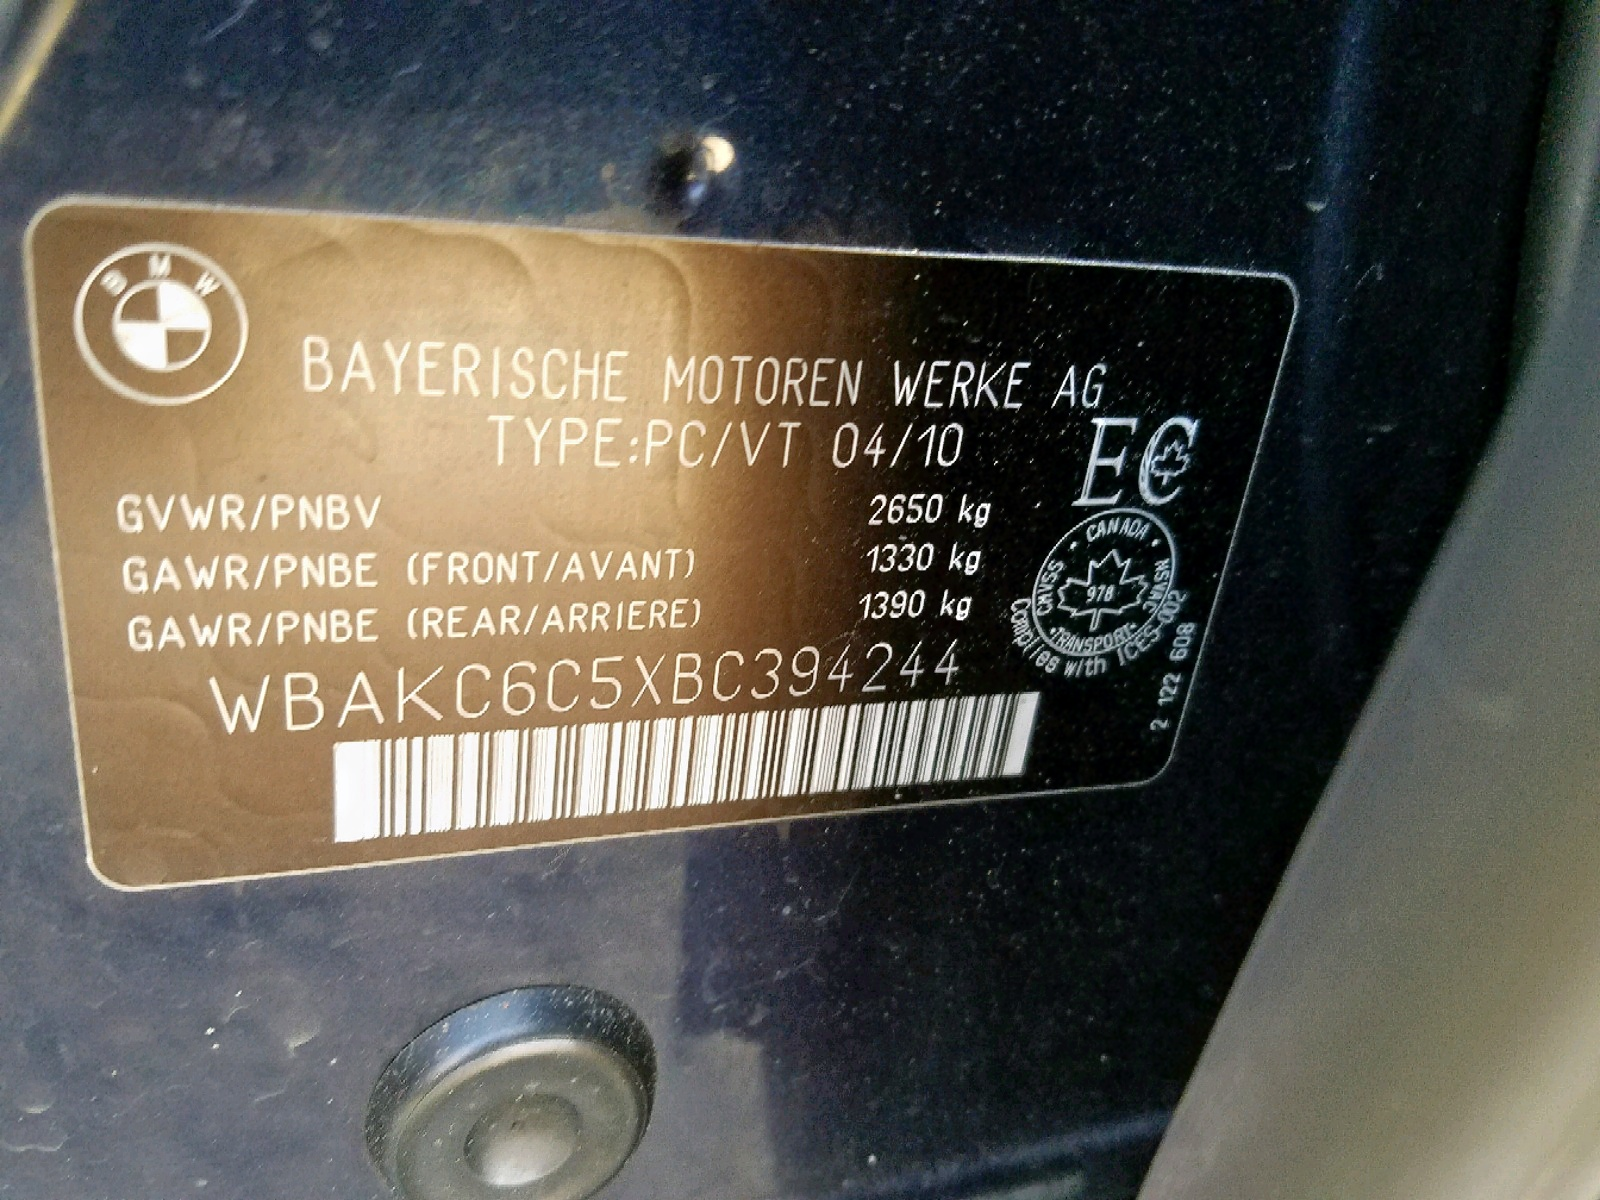 WBAKC6C5XBC394244 - 2011 Bmw 7 Series 4.4L